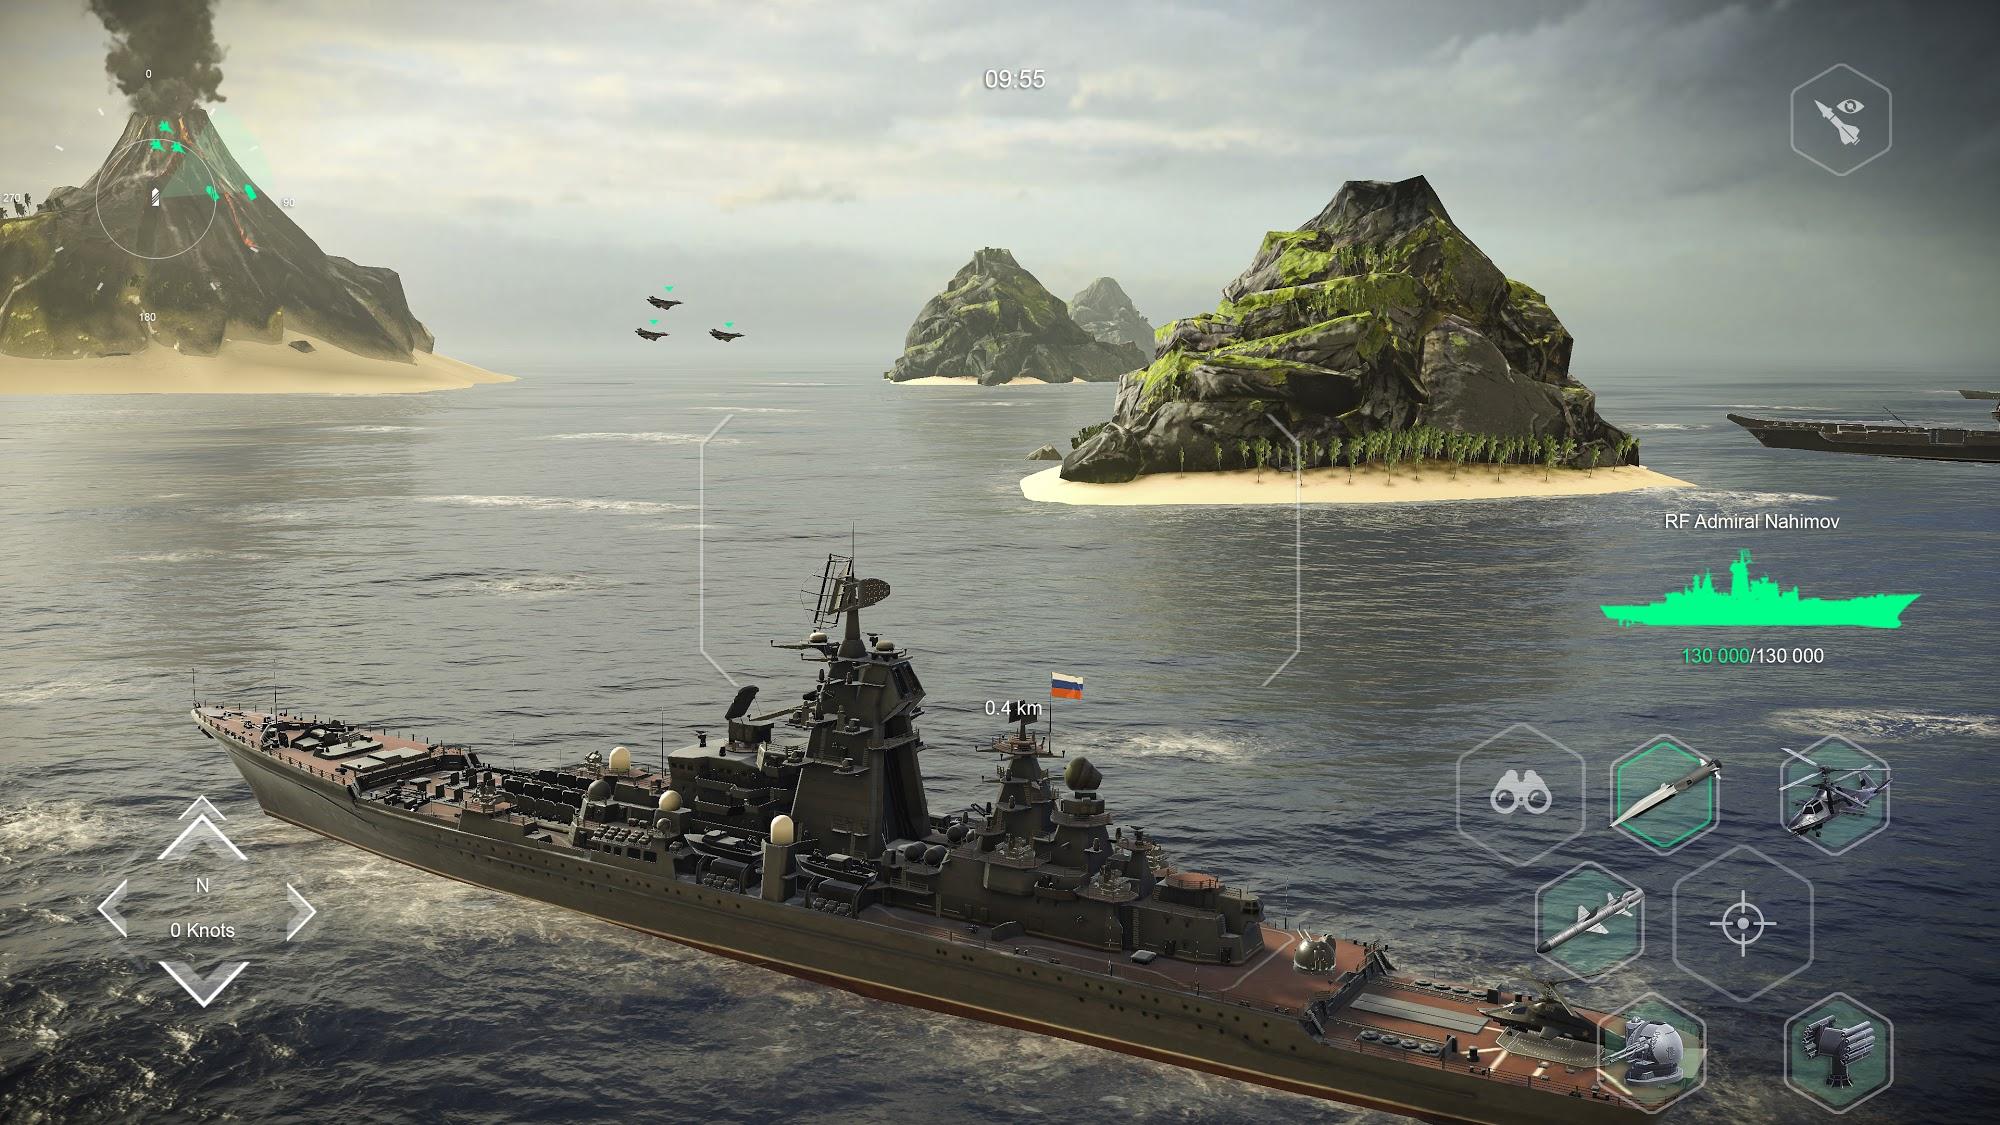 Kemampuan-Tempur-Armada-Terbaik-Dunia